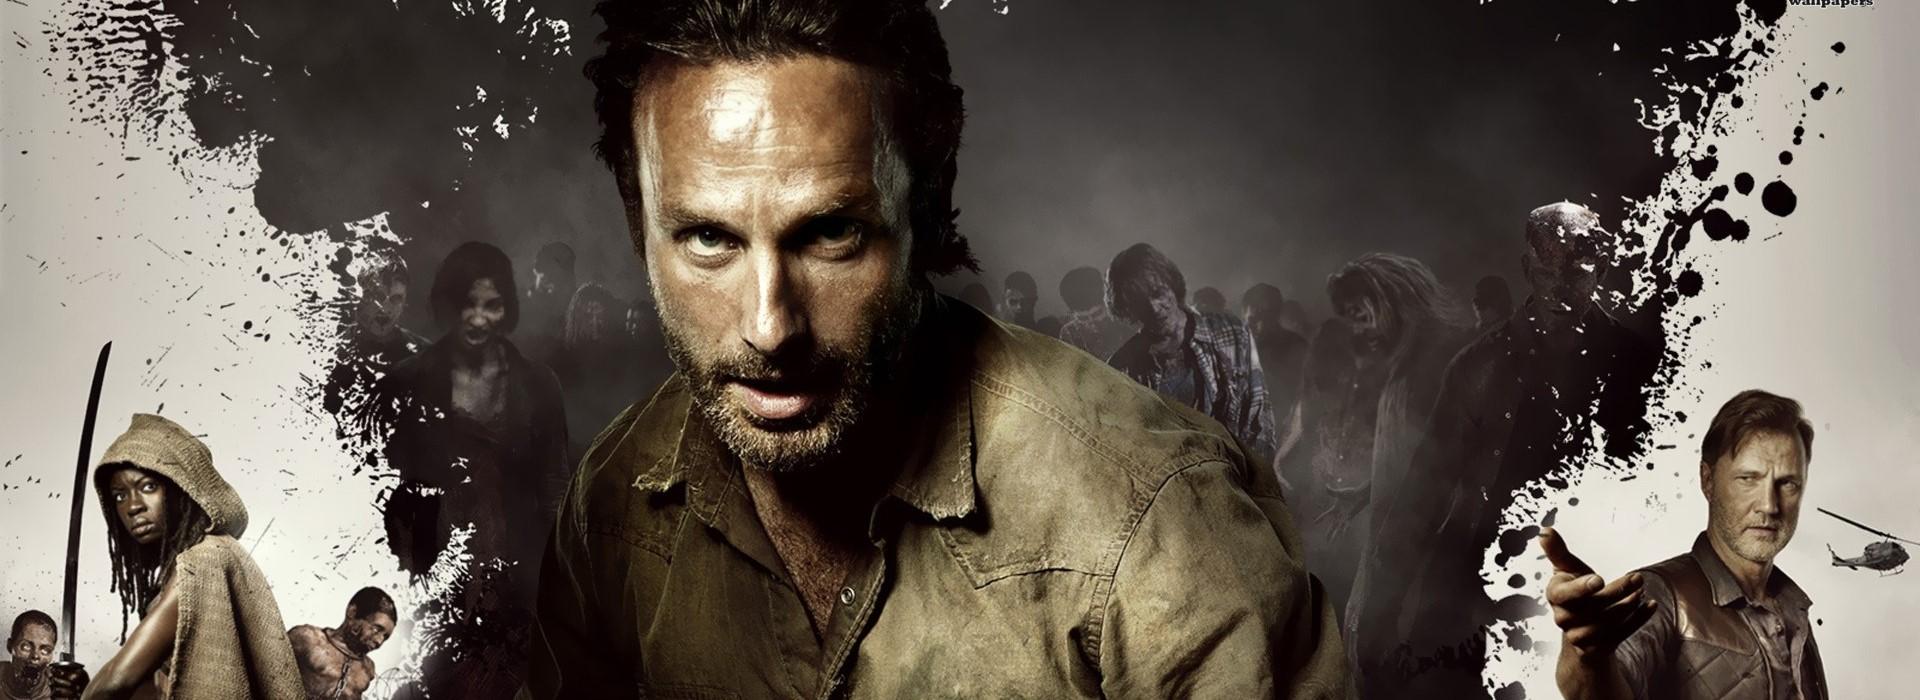 The Walking Dead Season 4 1080p cover